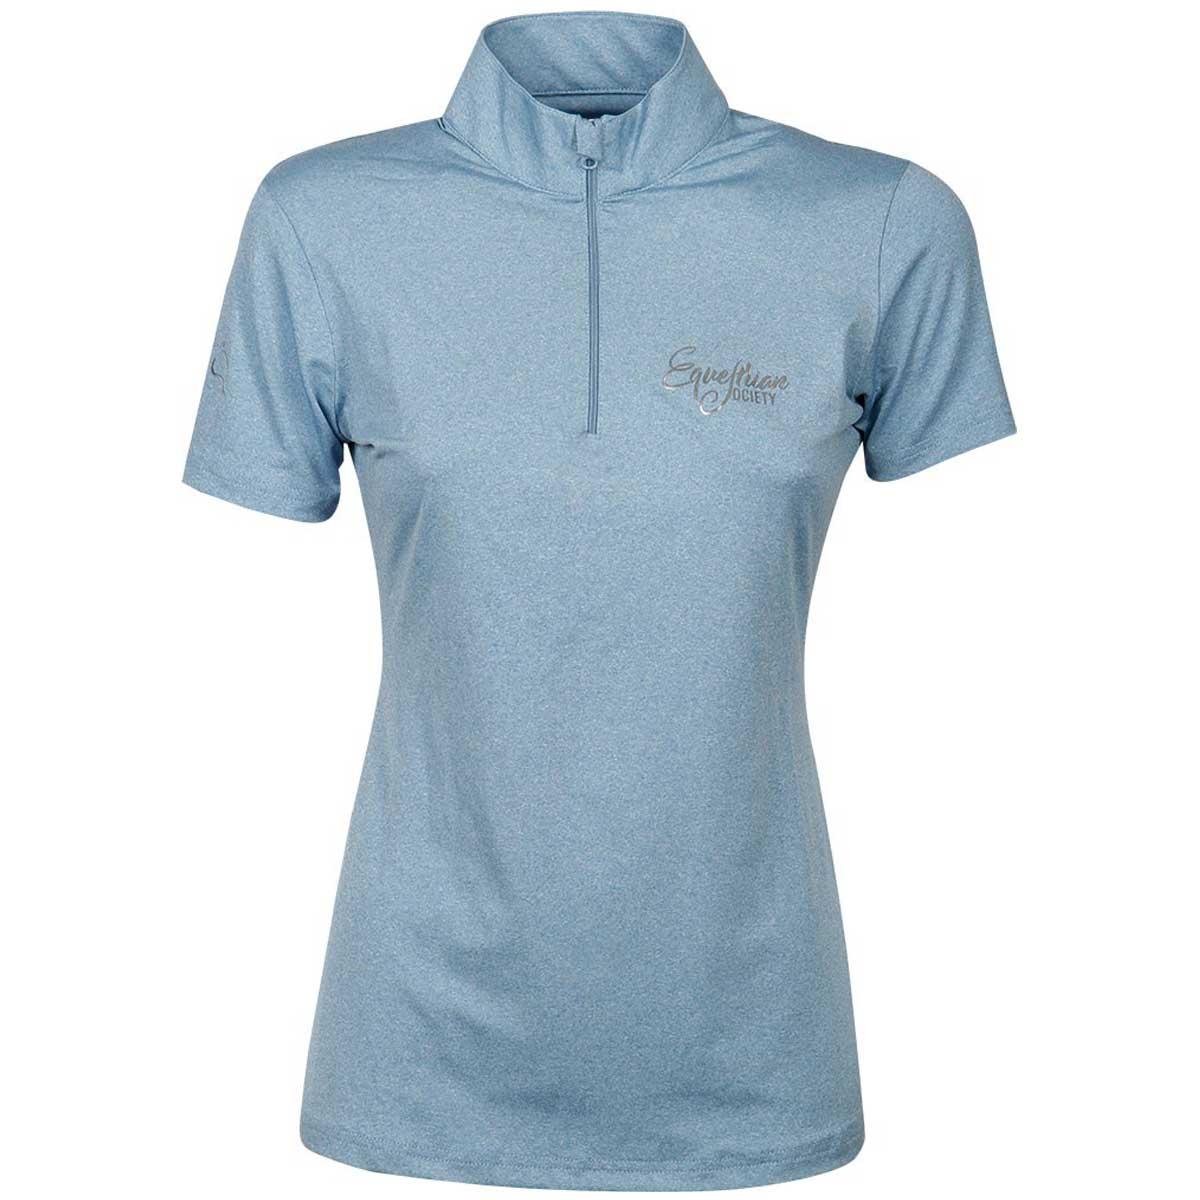 Harry's Horse Harding Techshirt lichtblauw maat:xxl